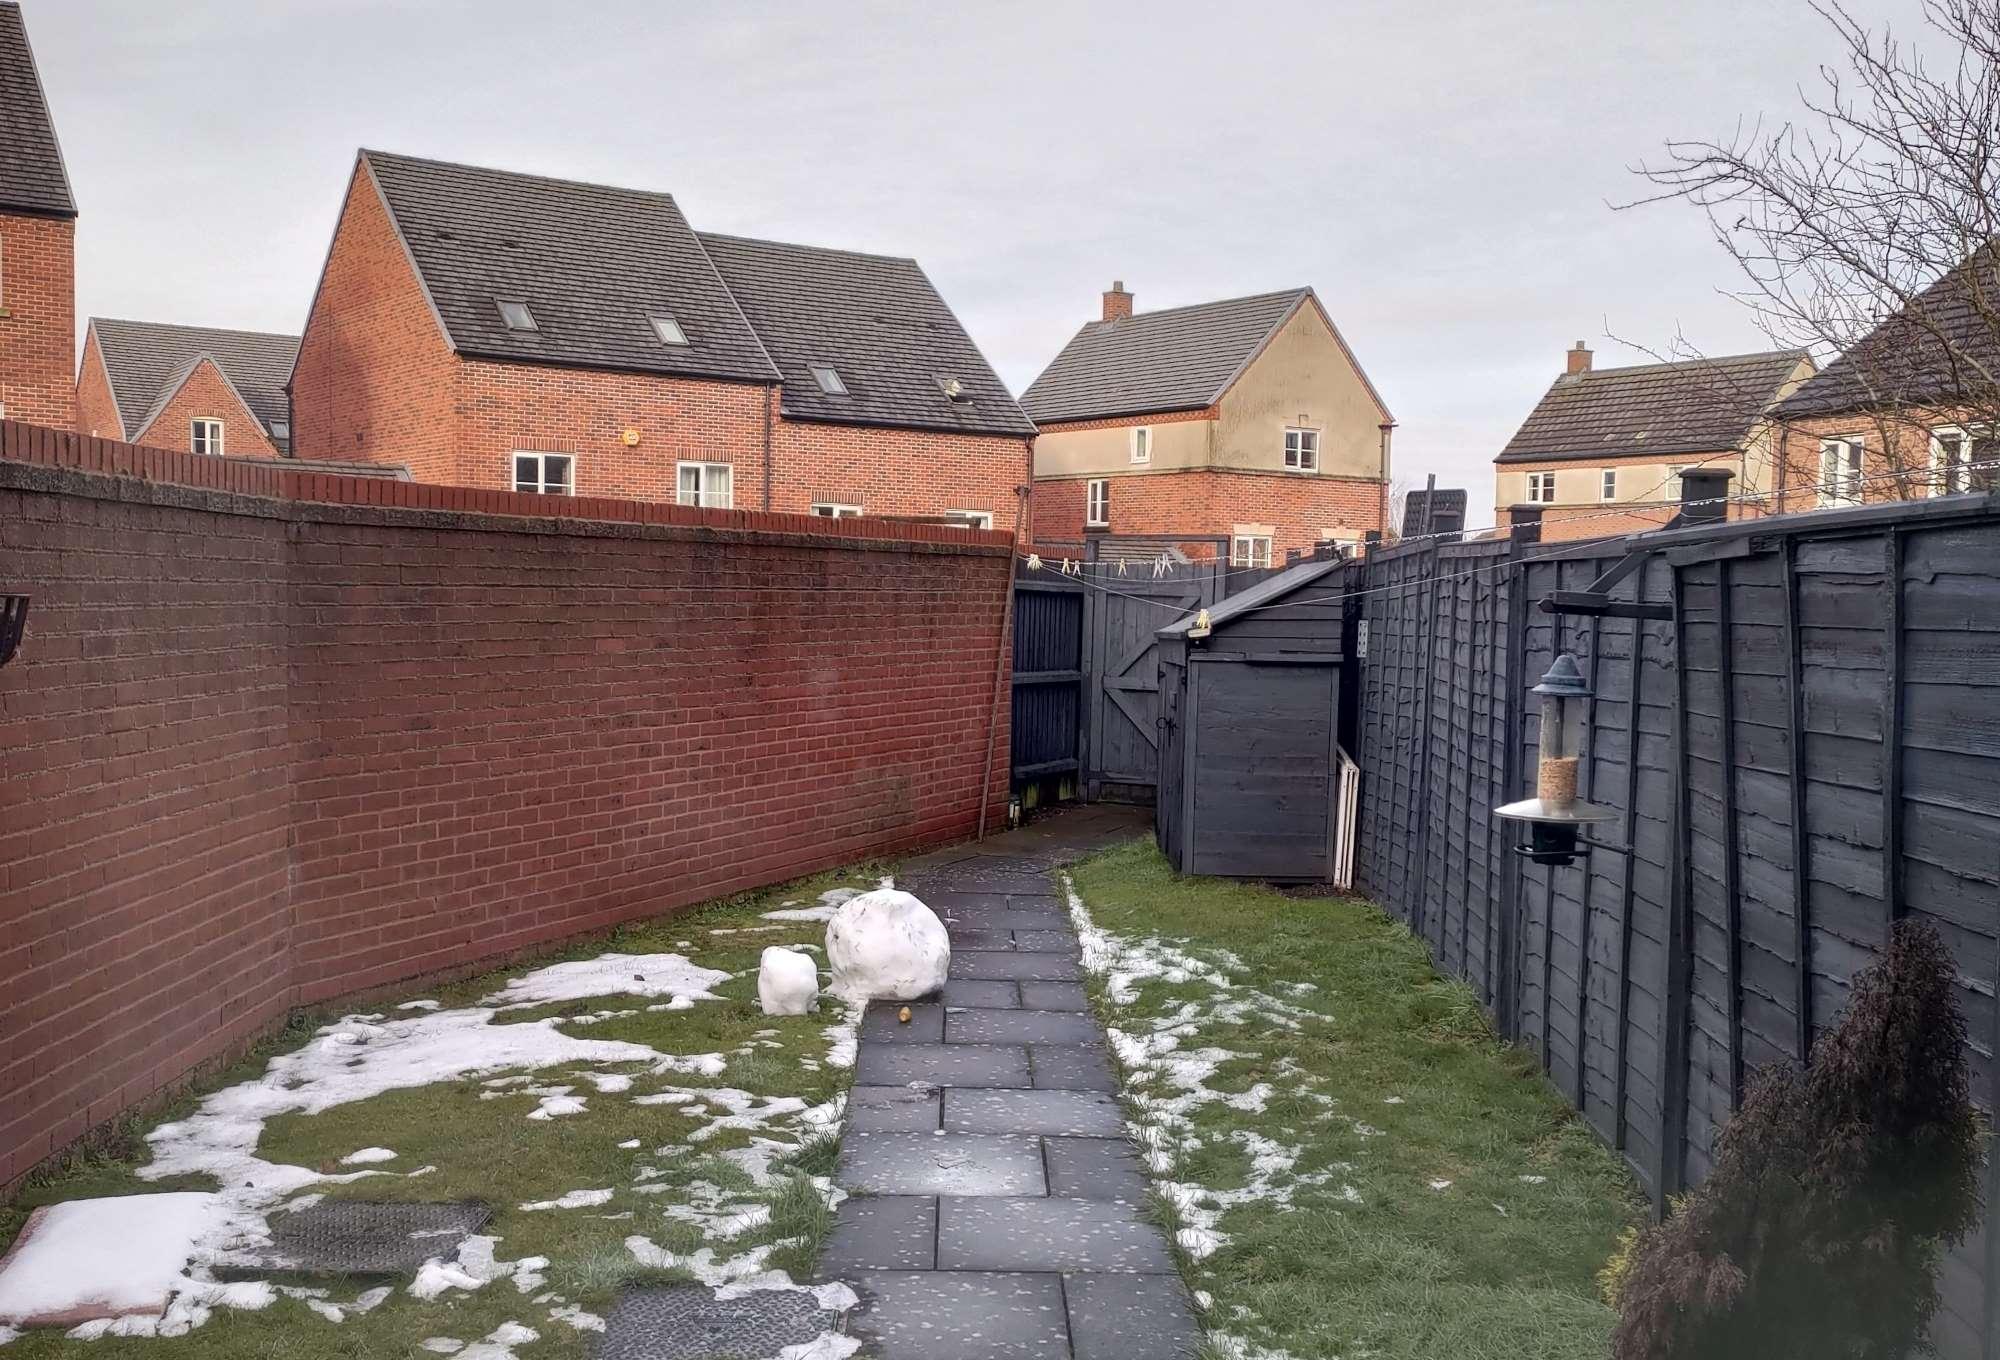 Birmingham house garden in winter